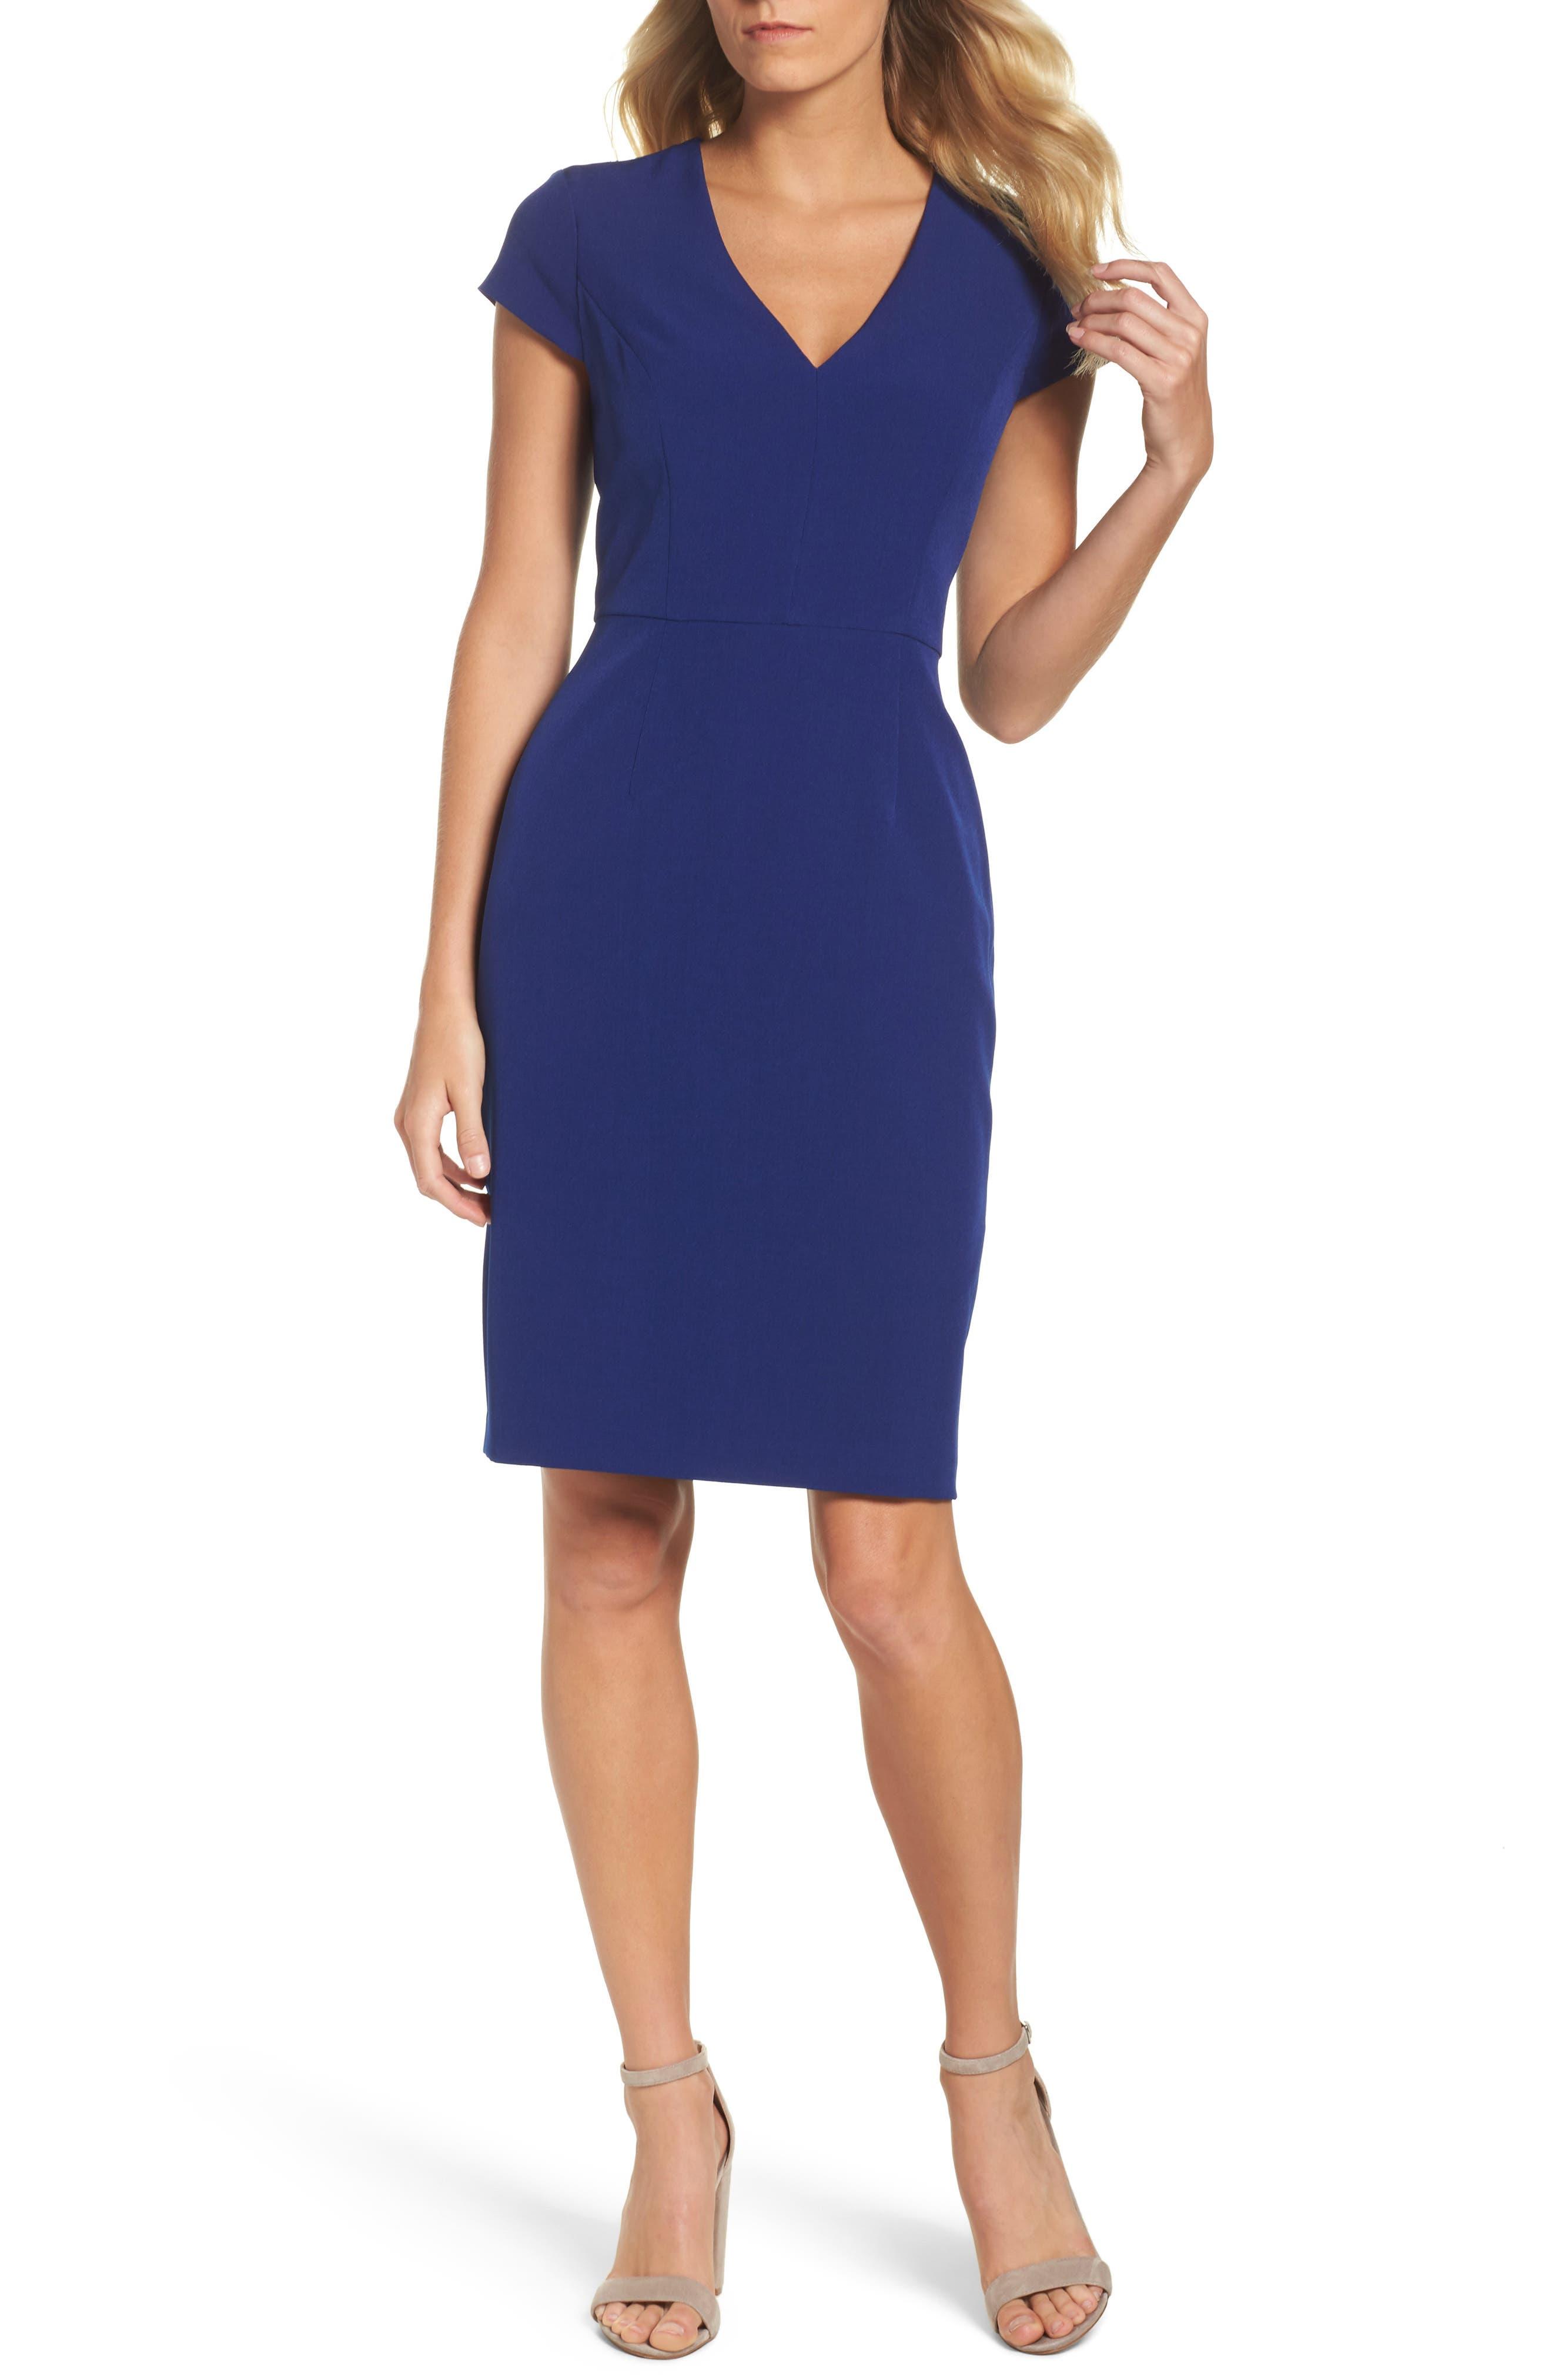 Alternate Image 1 Selected - Adrianna Papell Crepe Sheath Dress (Regular & Petite)